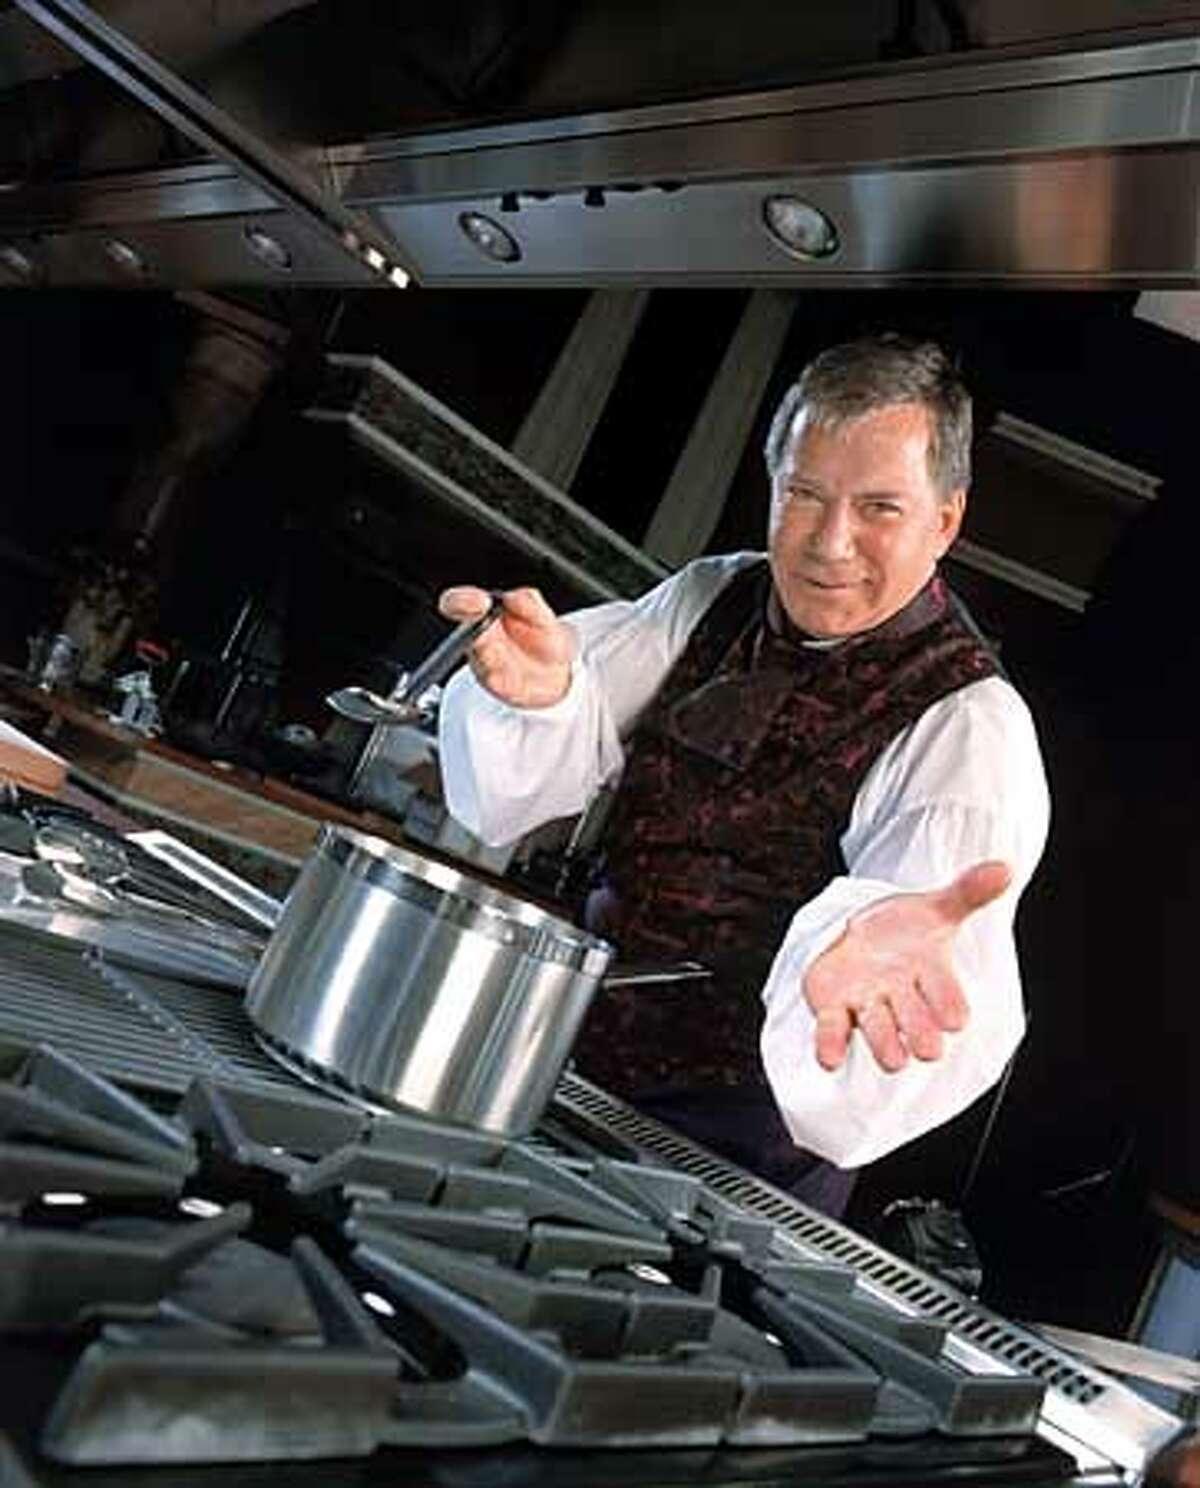 William Shatner on The Iron Chef. Photo: Nelson Machin/UPN. HANDOUT.